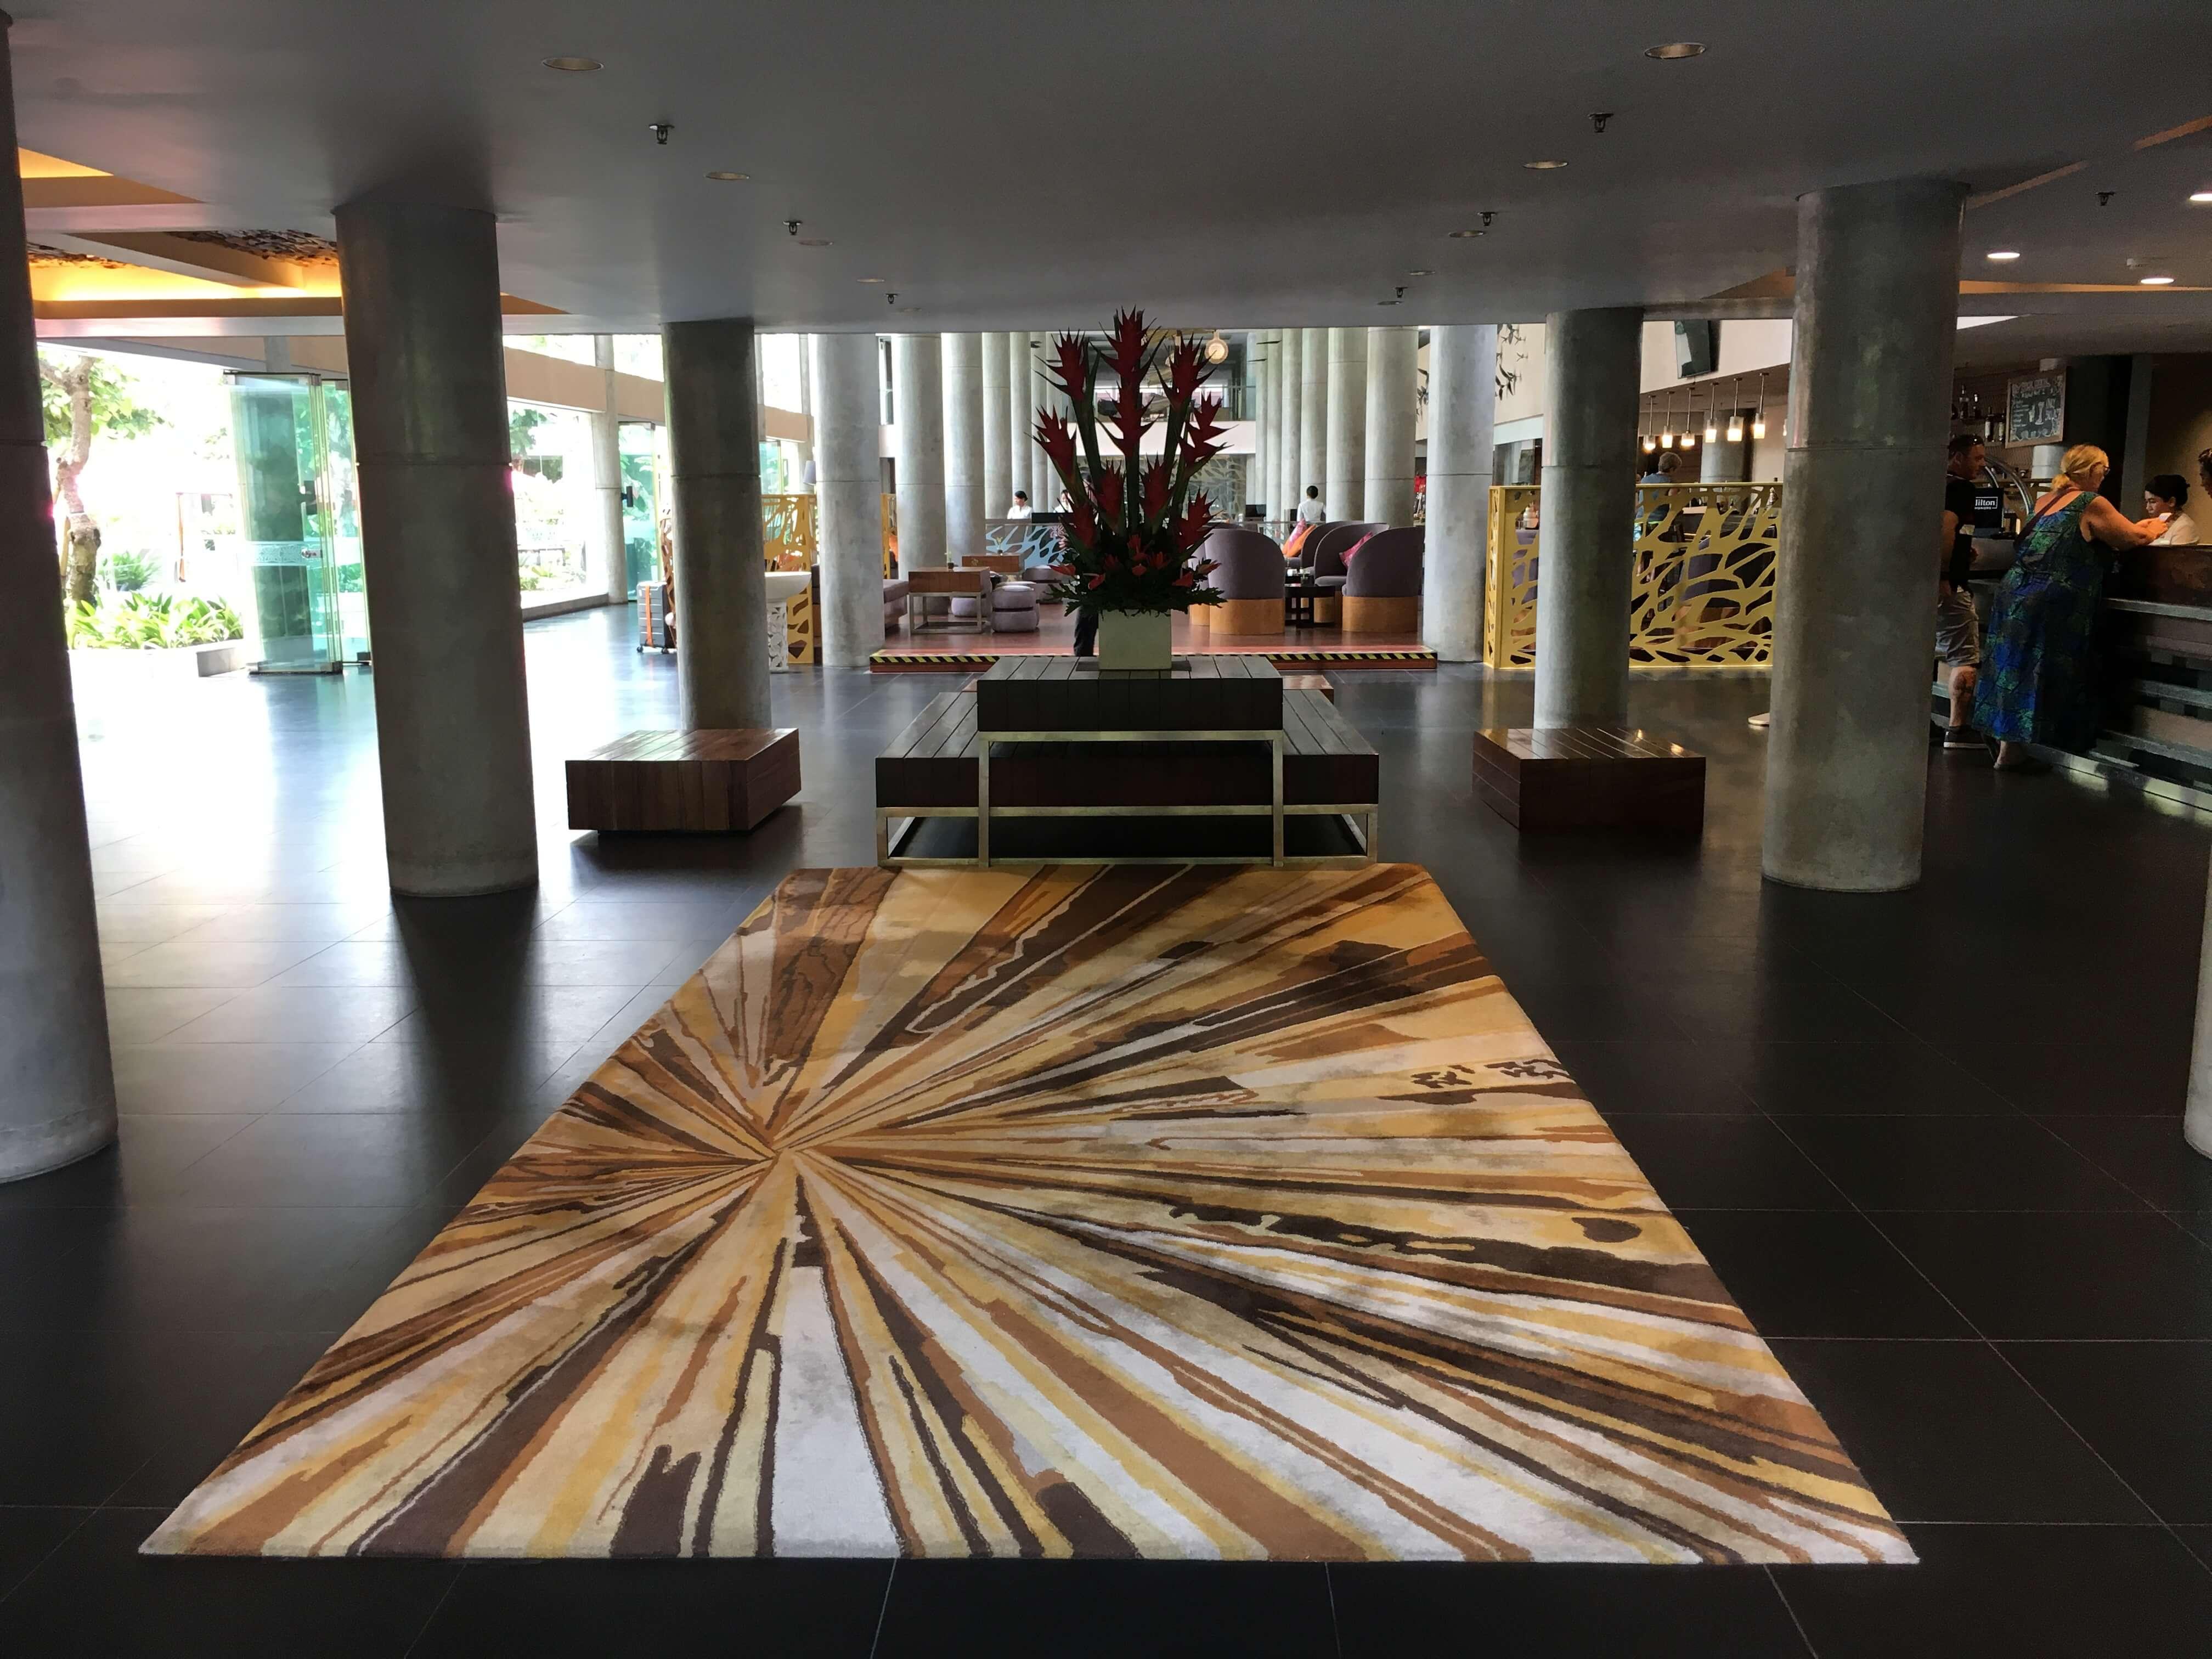 Lounge Review : 香港空港(HKG) キャセイパシフィック航空(CX)ラウンジ「the Pier」(ファーストクラス)